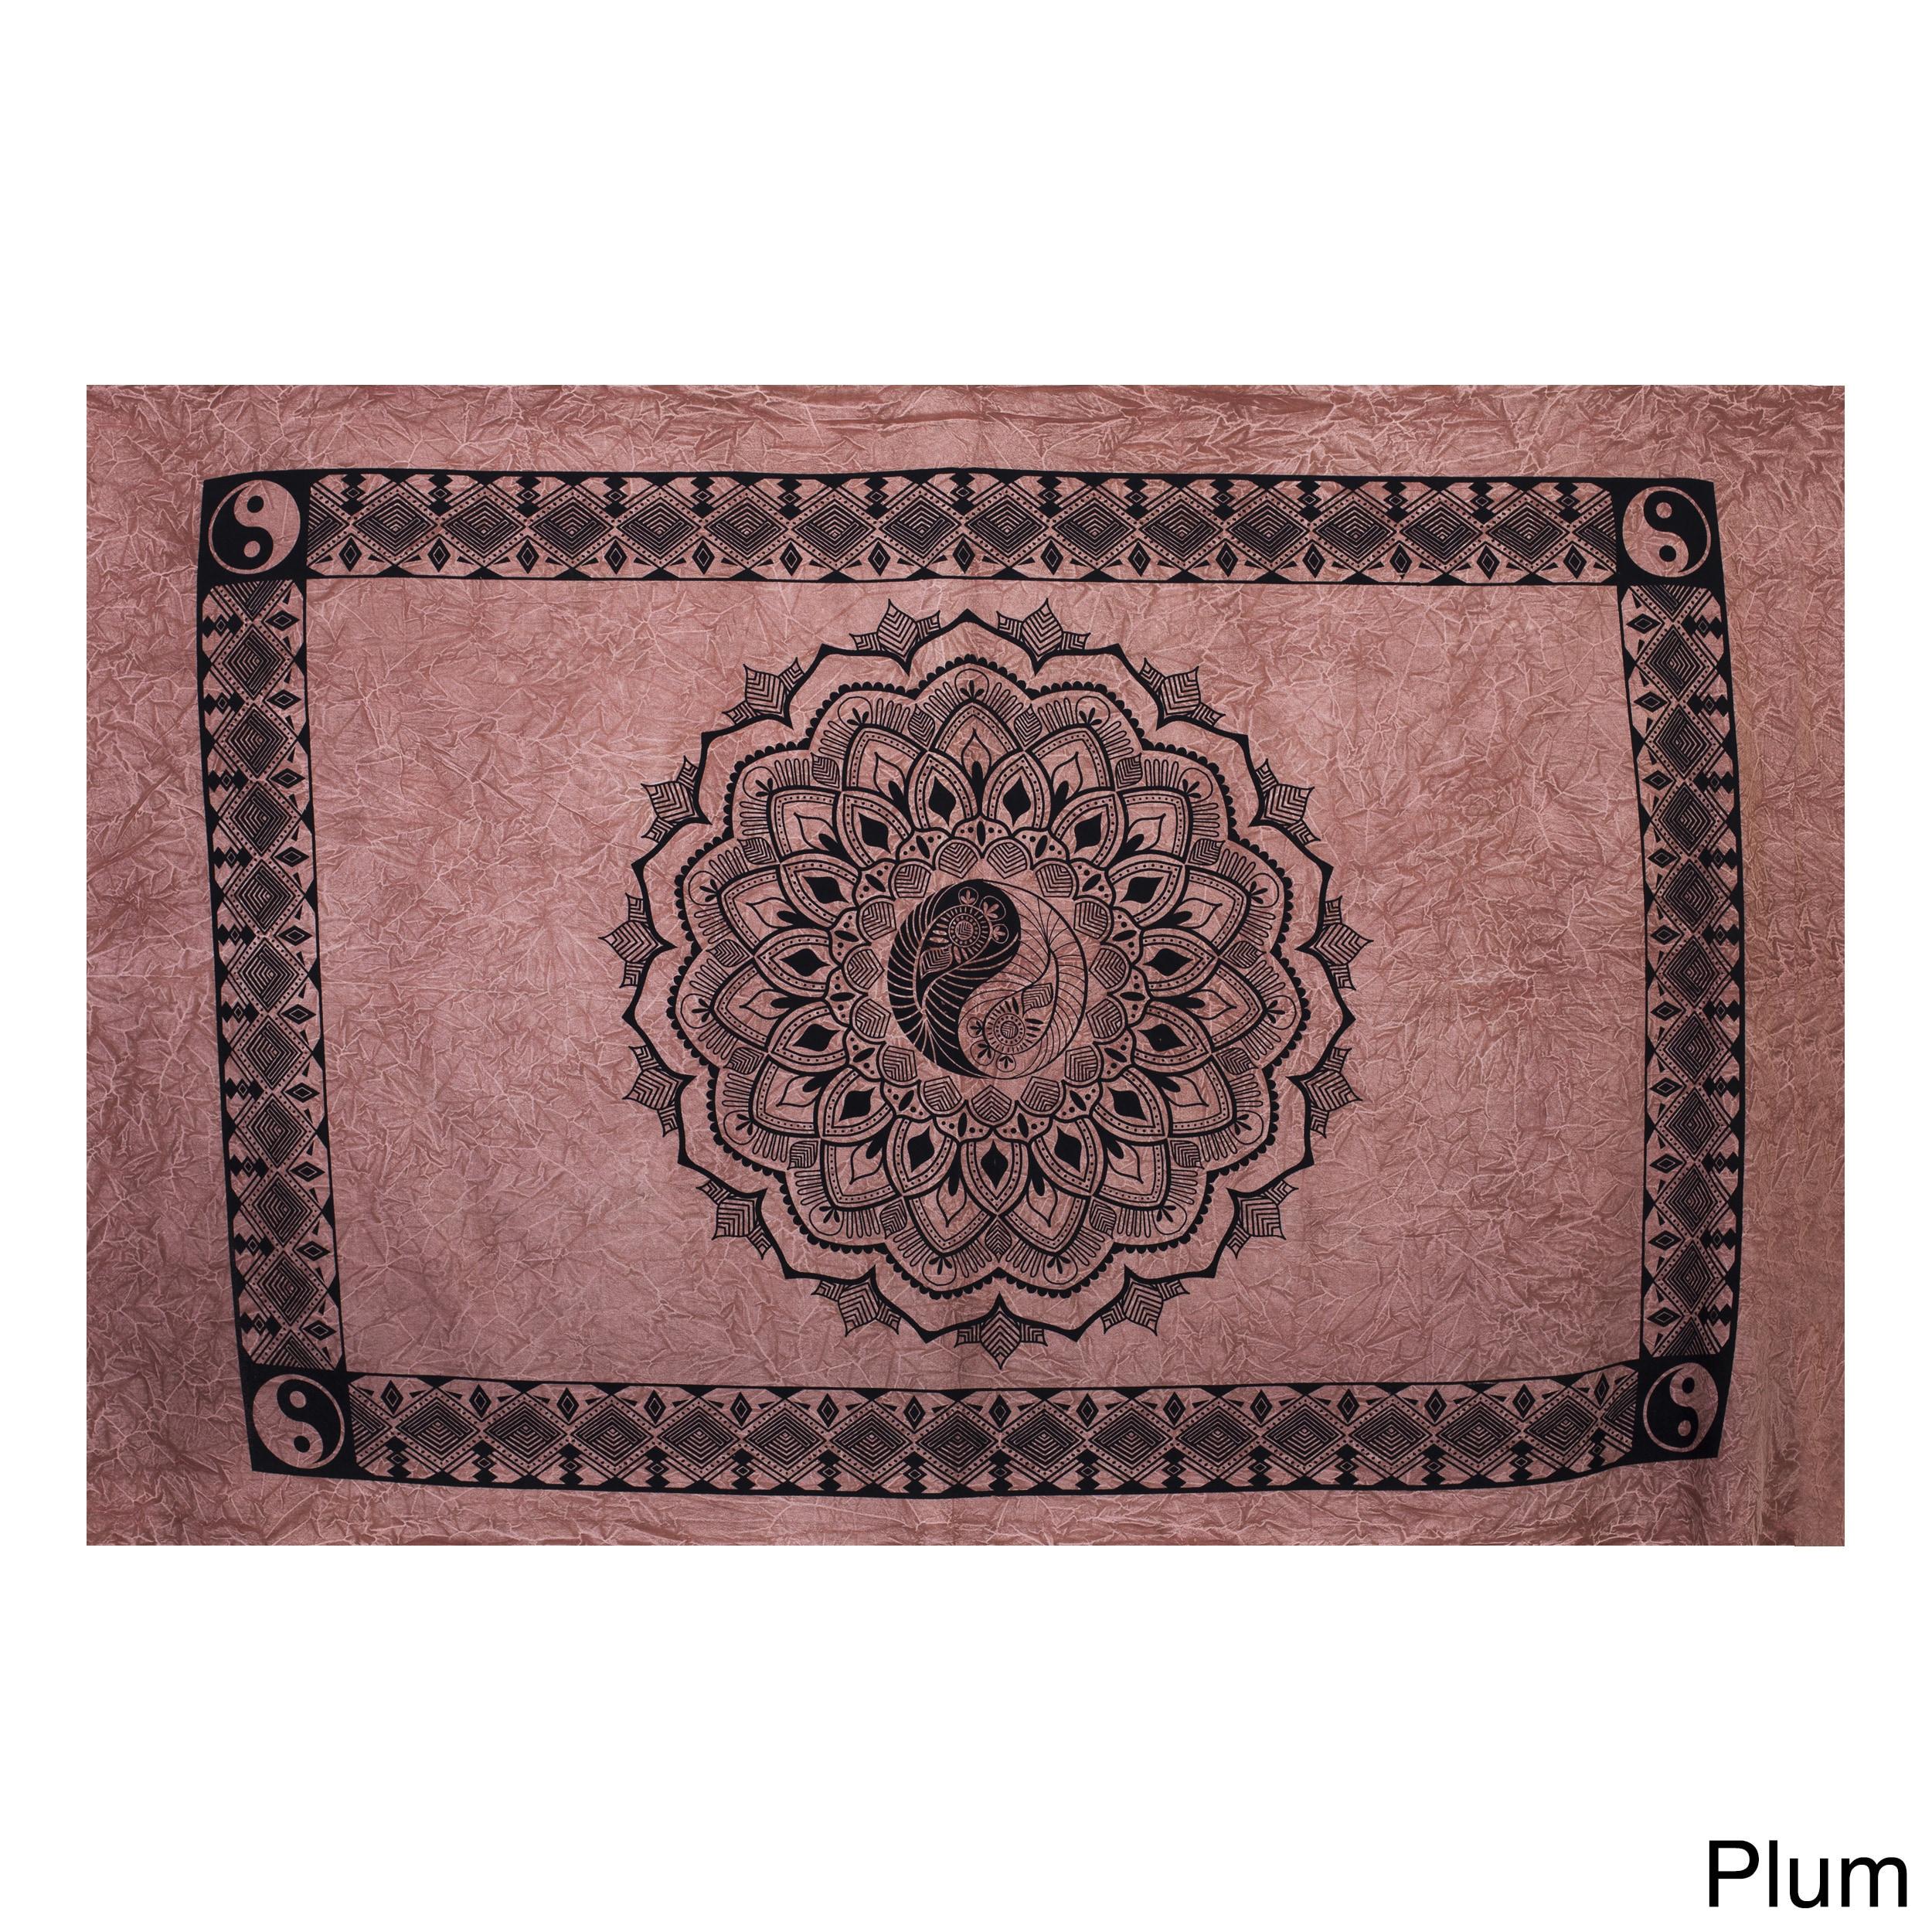 Handmade Yin Yang Lotus Pond Tapestry (India) (Plum), Bro...